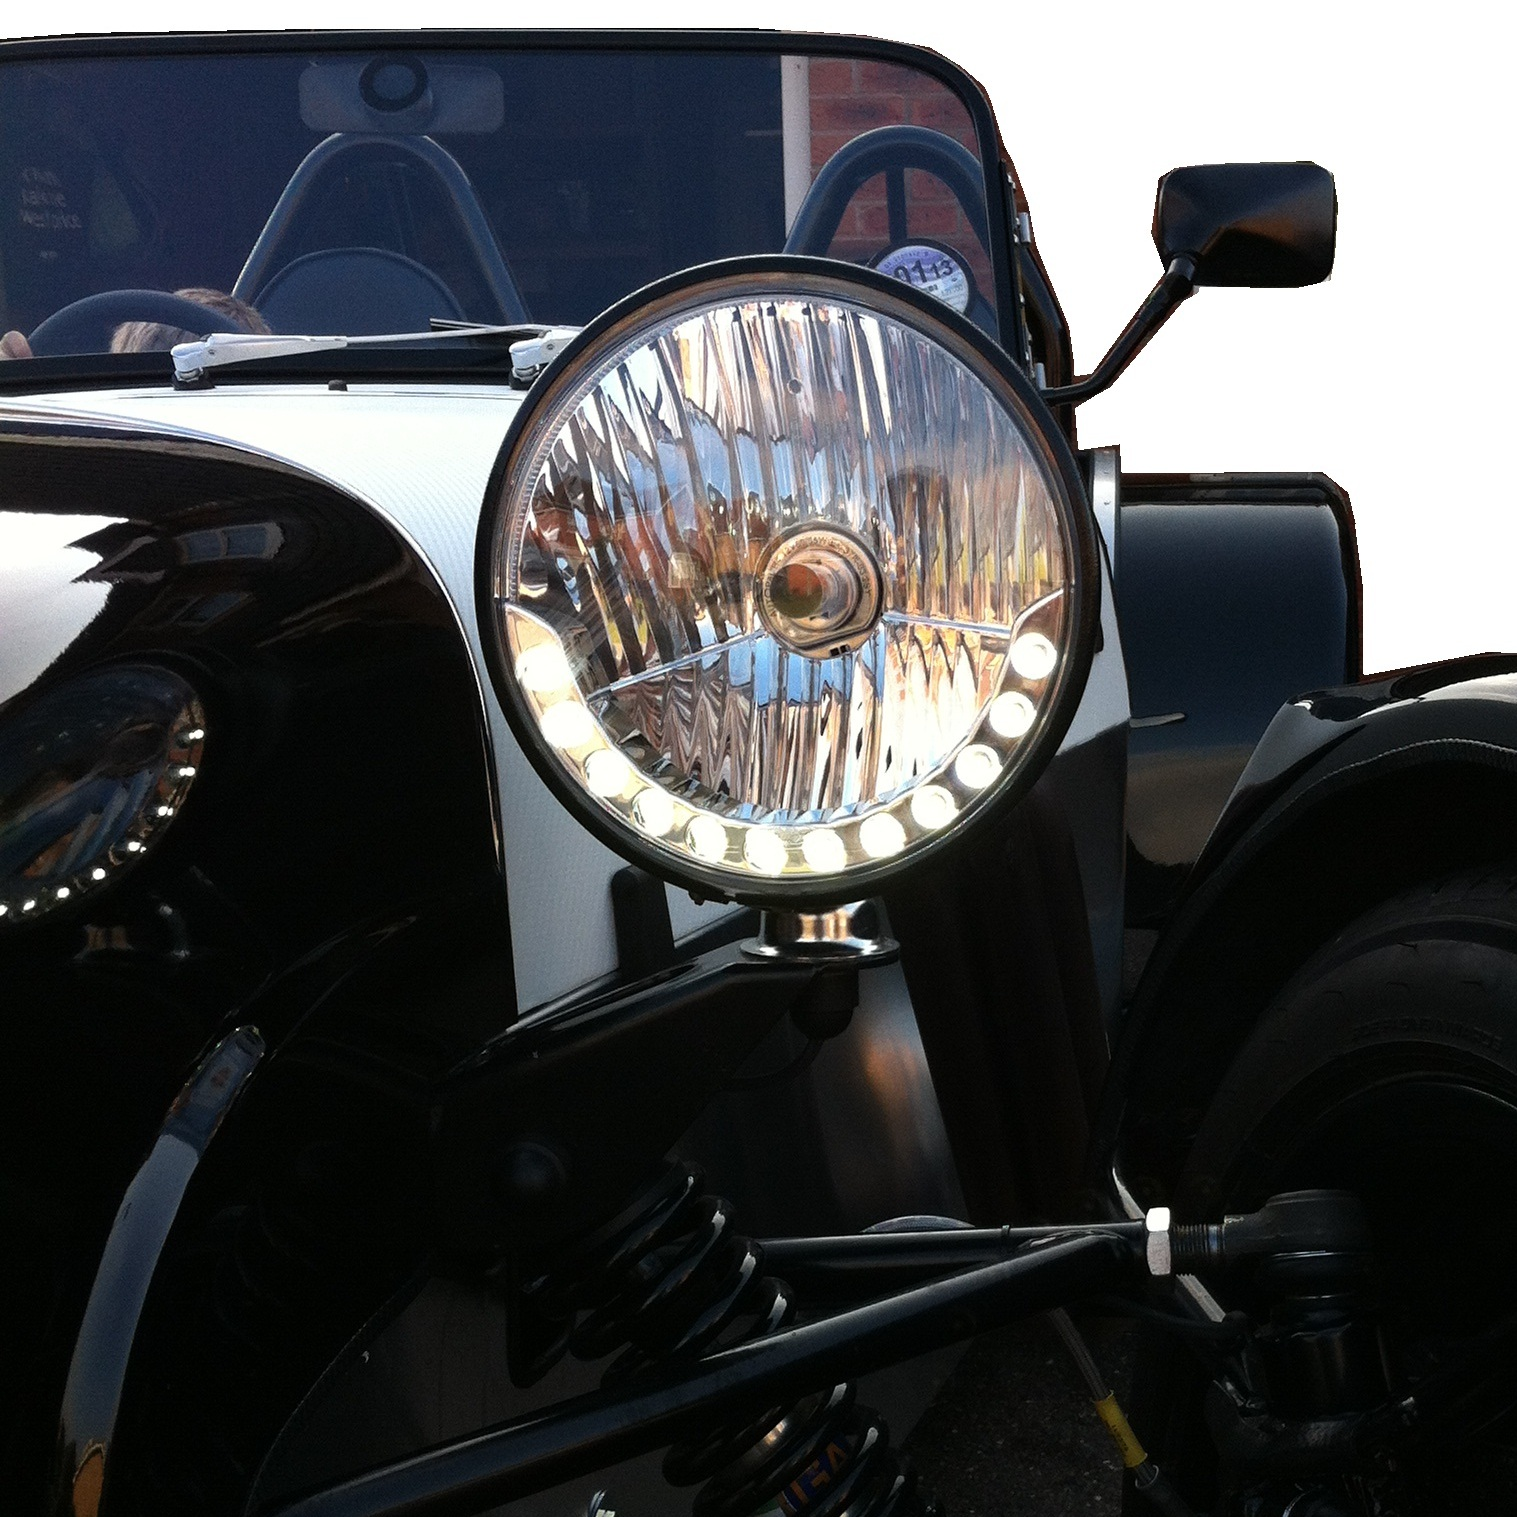 new 7 round led drl style kit car headlight leadlamp halogen westfield h4 lotus ebay. Black Bedroom Furniture Sets. Home Design Ideas